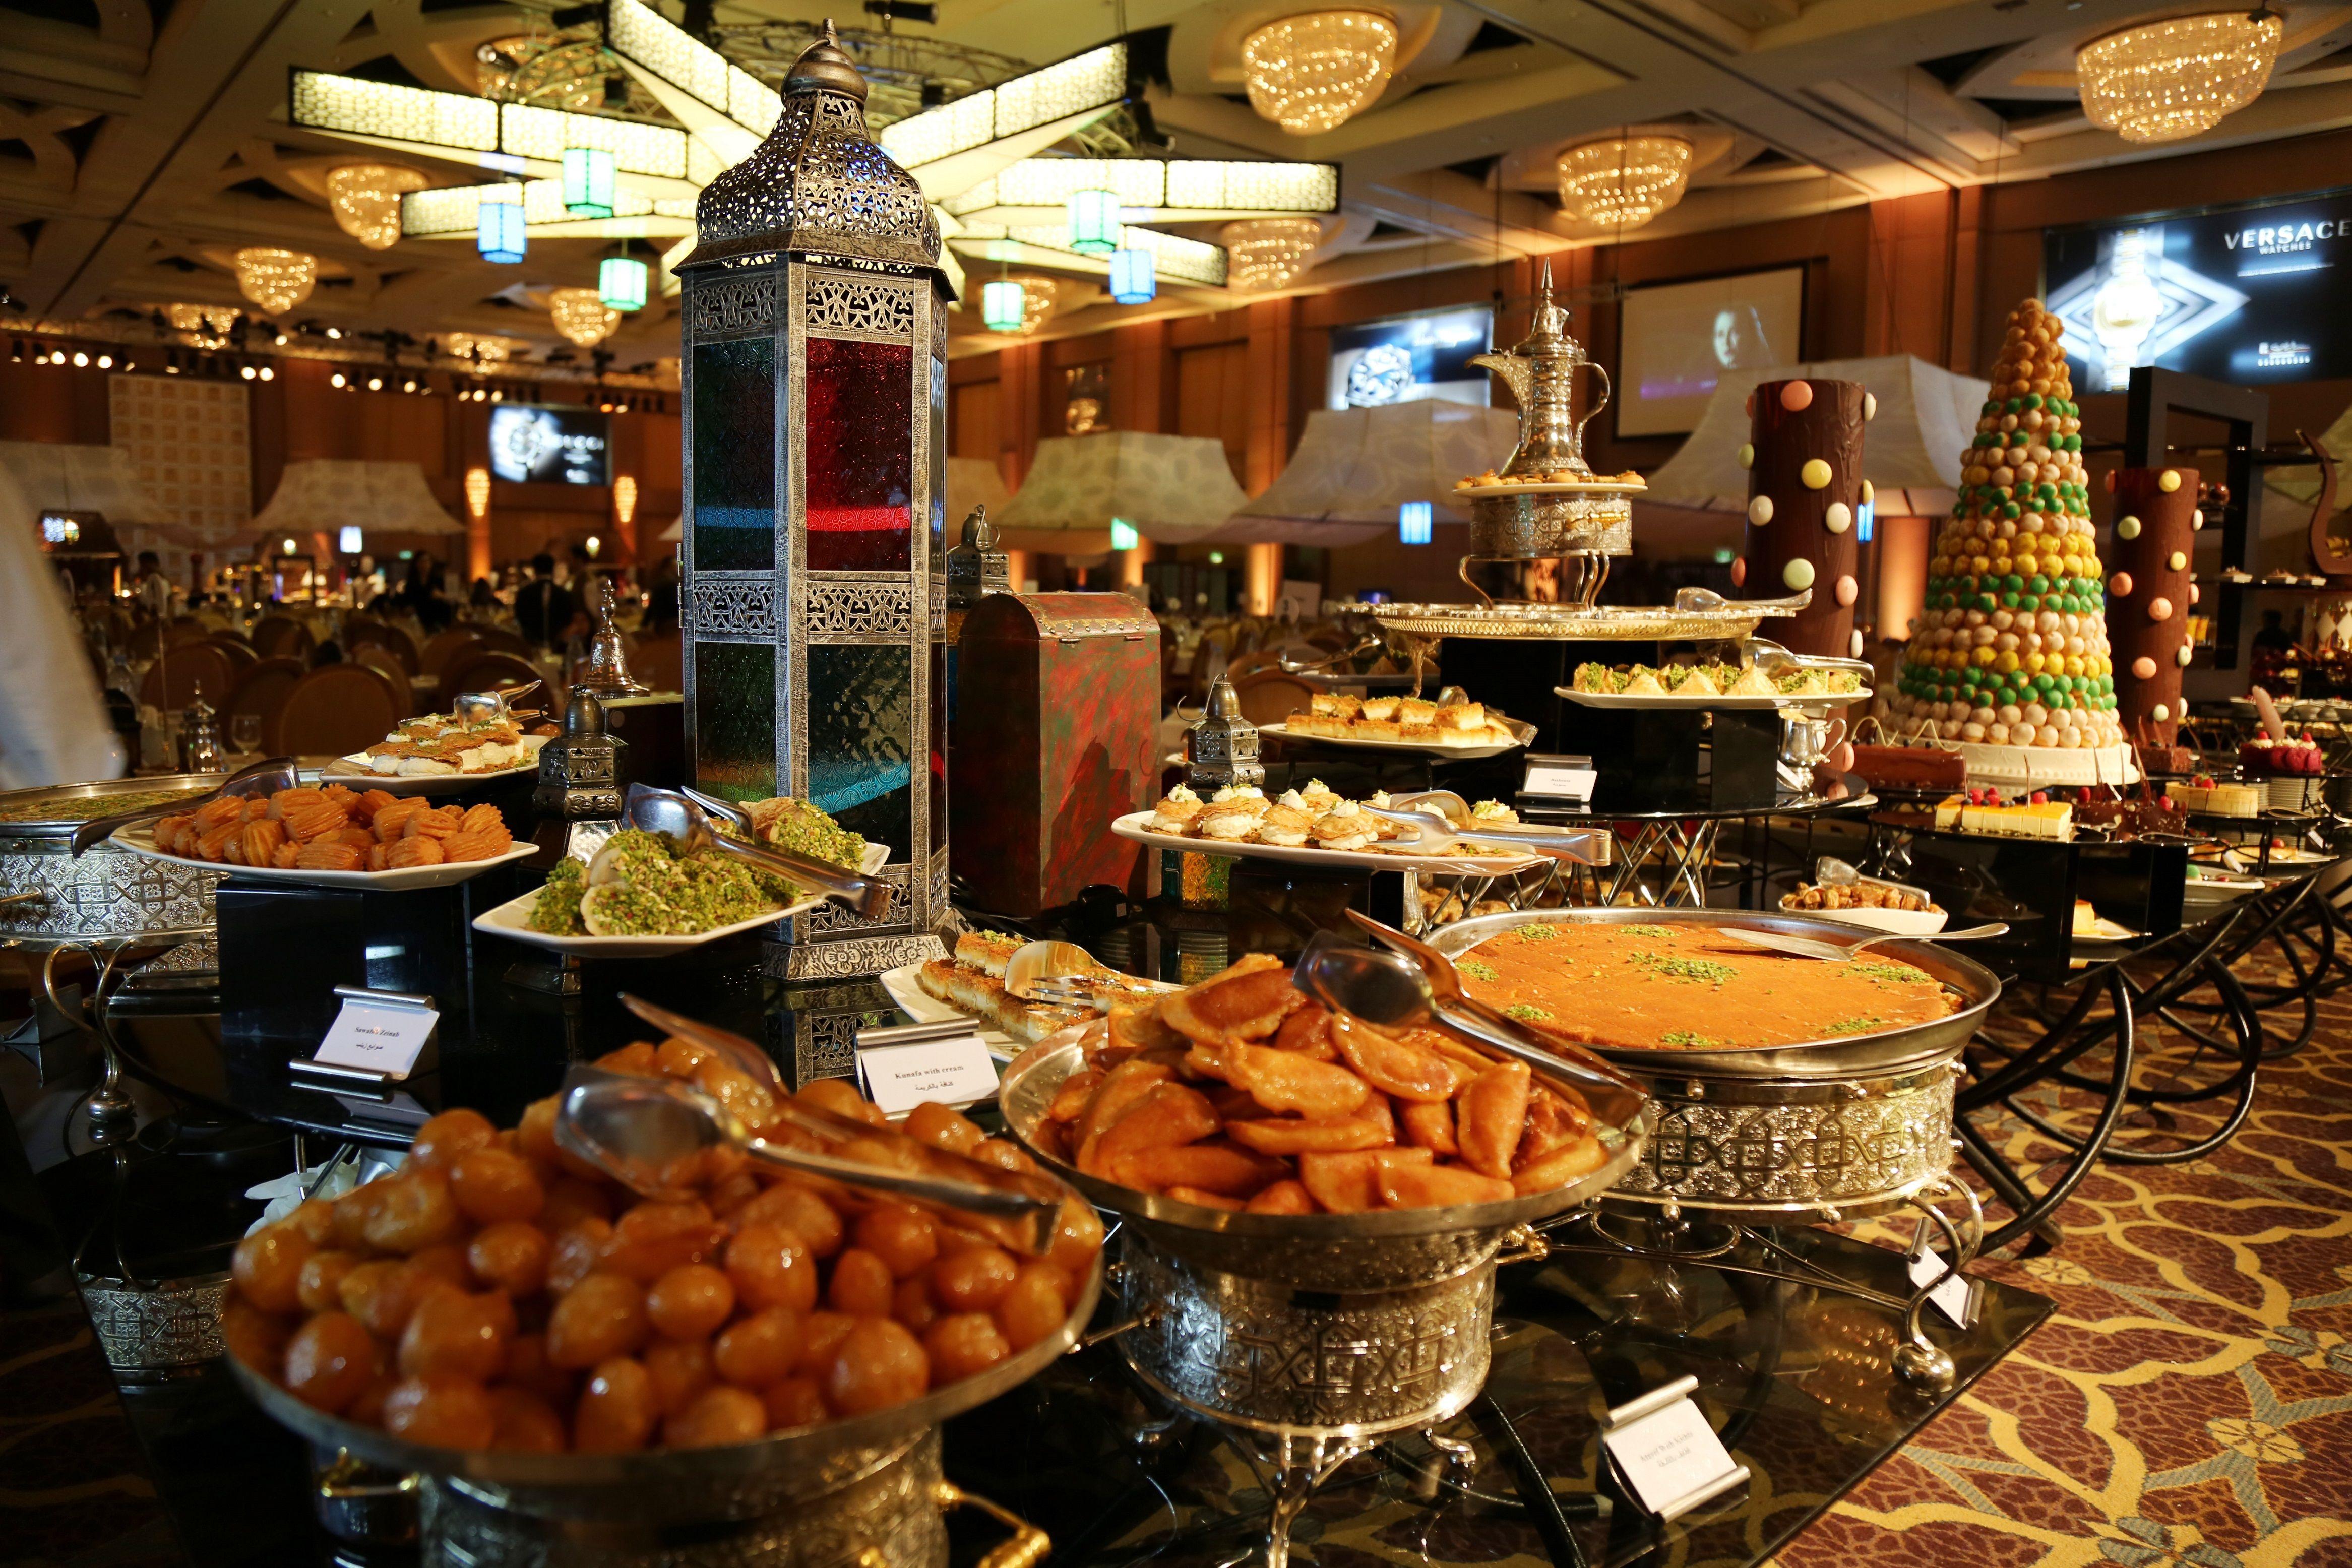 A Dessert Buffet With A Wide Variety Of Offerings At Four Seasons Hotel Riyadh Ramadan Tent Ramadantome Fourseason Dessert Buffet Ramadan Celebration Buffet